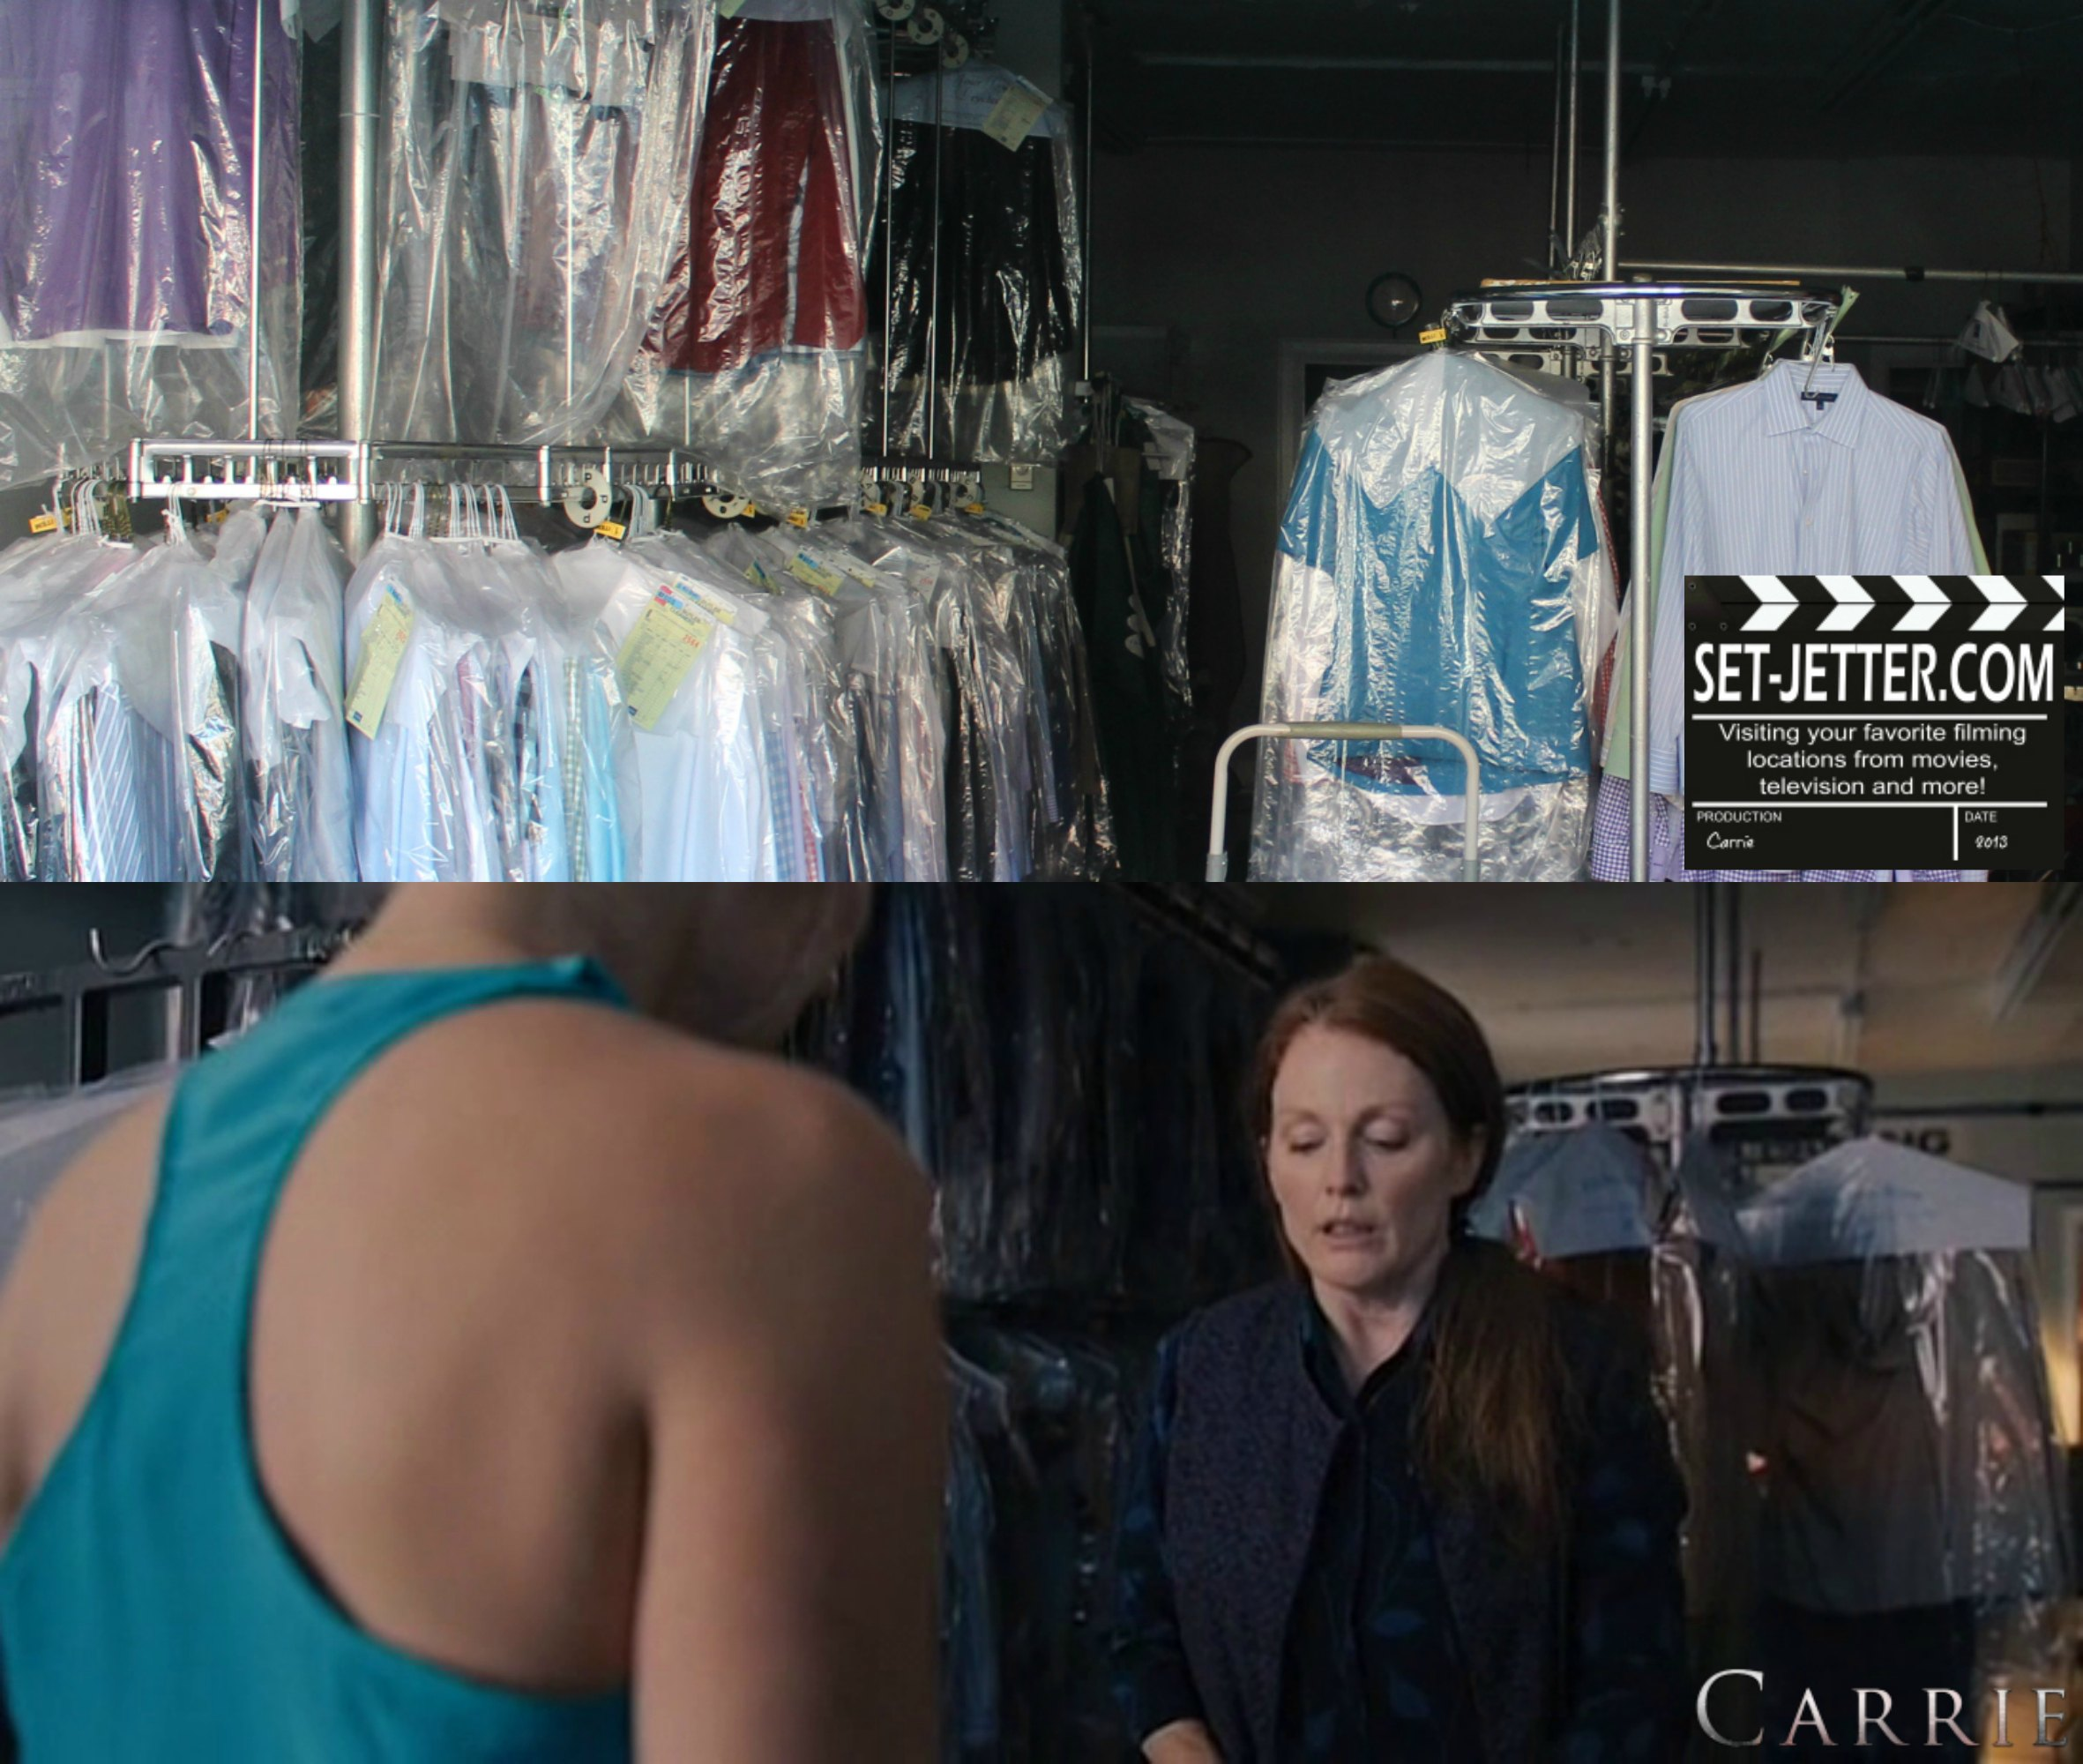 Carrie 2013 comparison 148.jpg